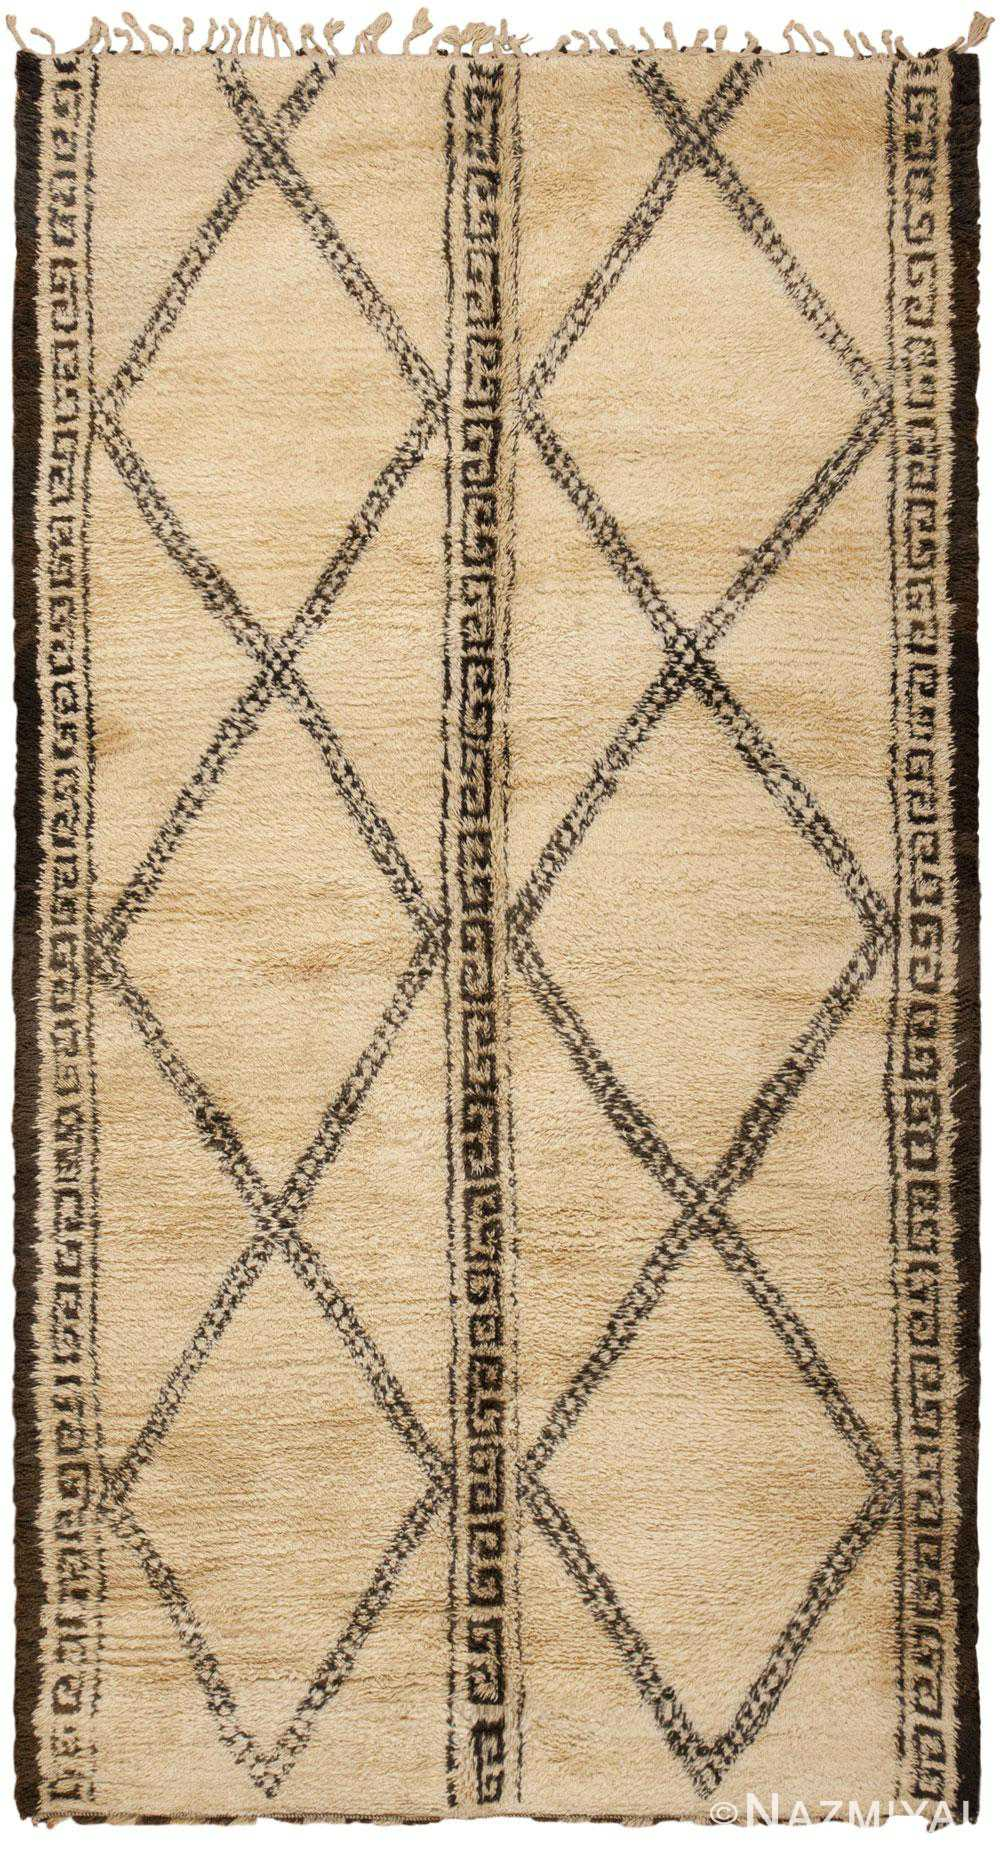 Vintage Moroccan Rug 46168 Detail/Large View